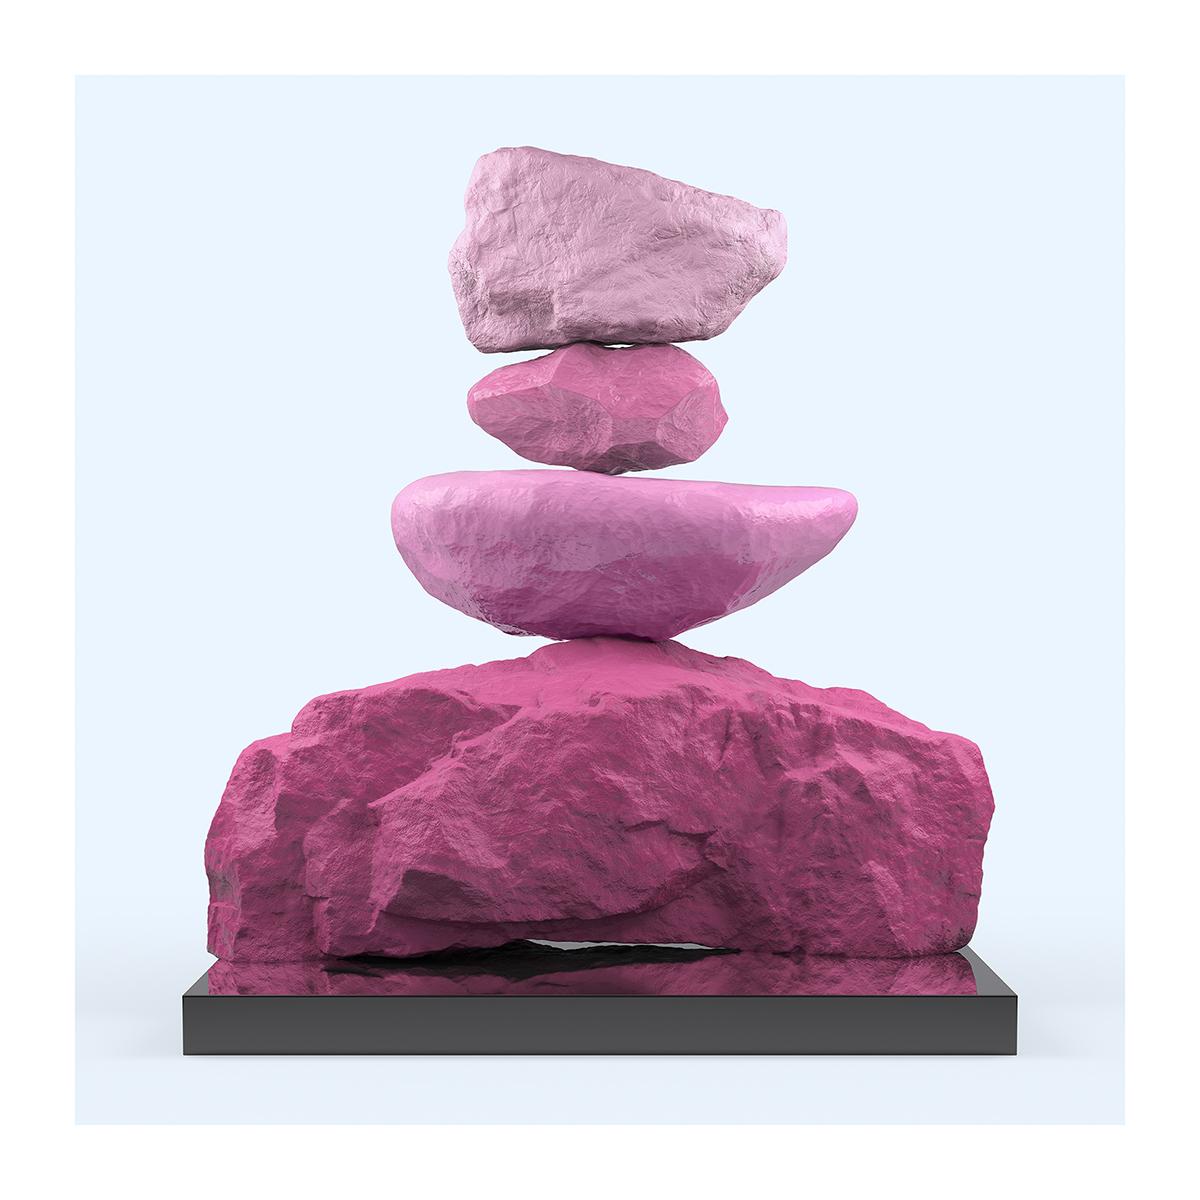 145 I will not Make any more Boring Art XXIV 002 - 2021 - I will not Make any more Boring Art. XXIV. (Rock Balancing - The Rose Period)